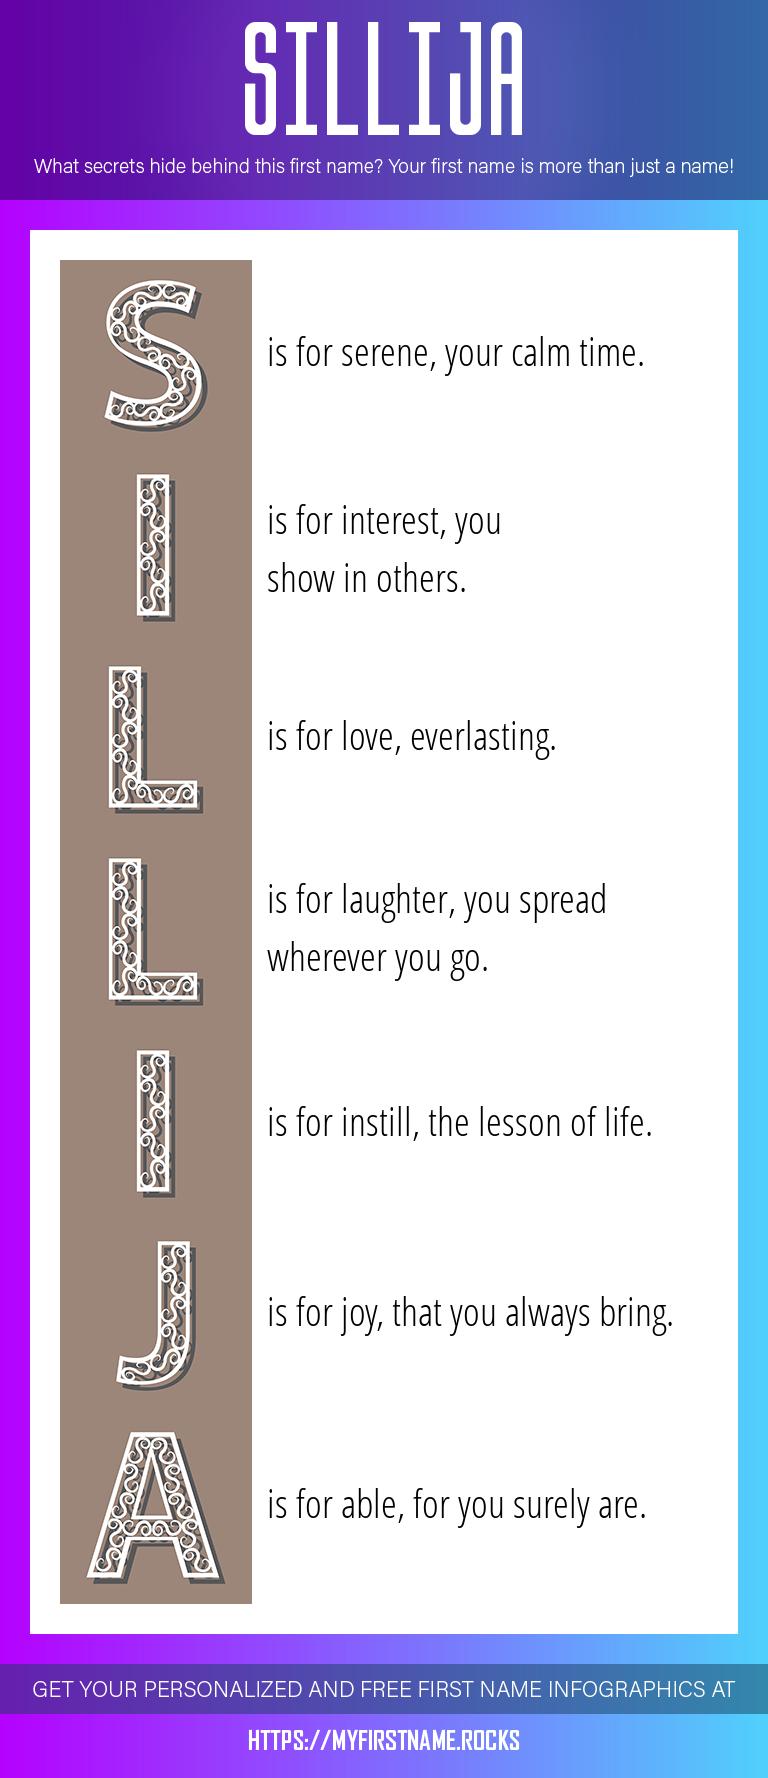 Sillija Infographics